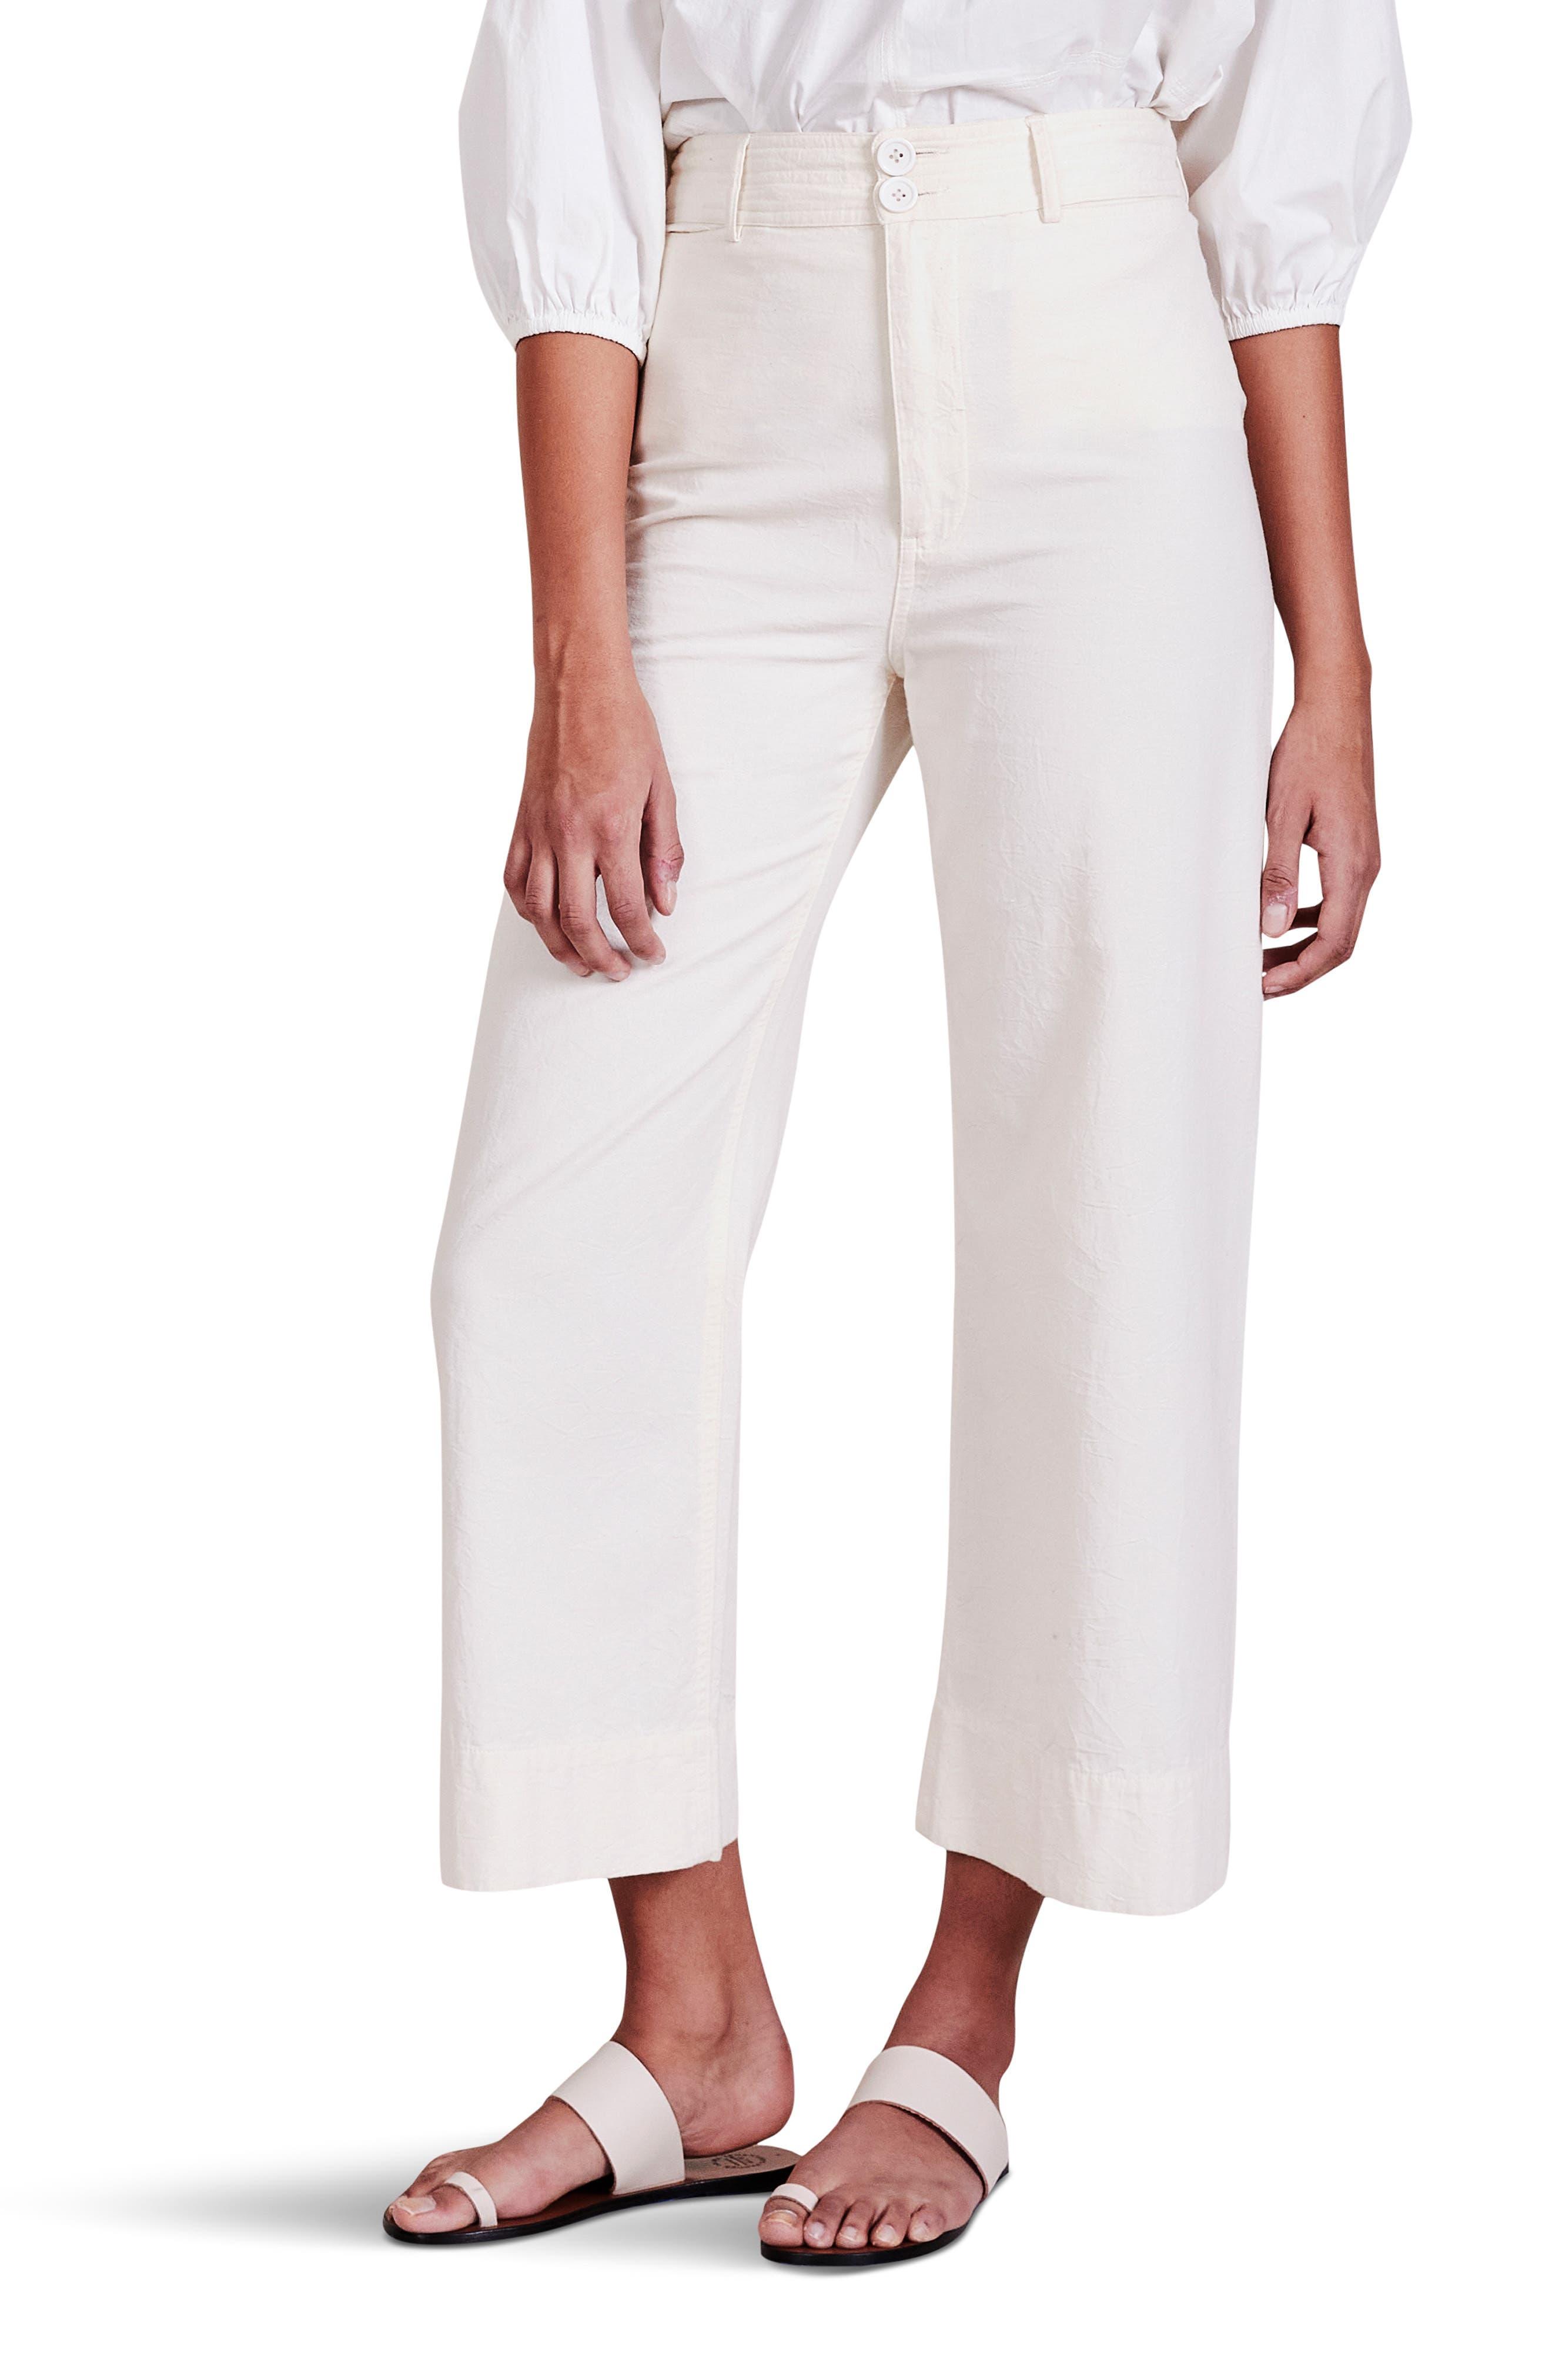 Merida High Waist Crop Pants